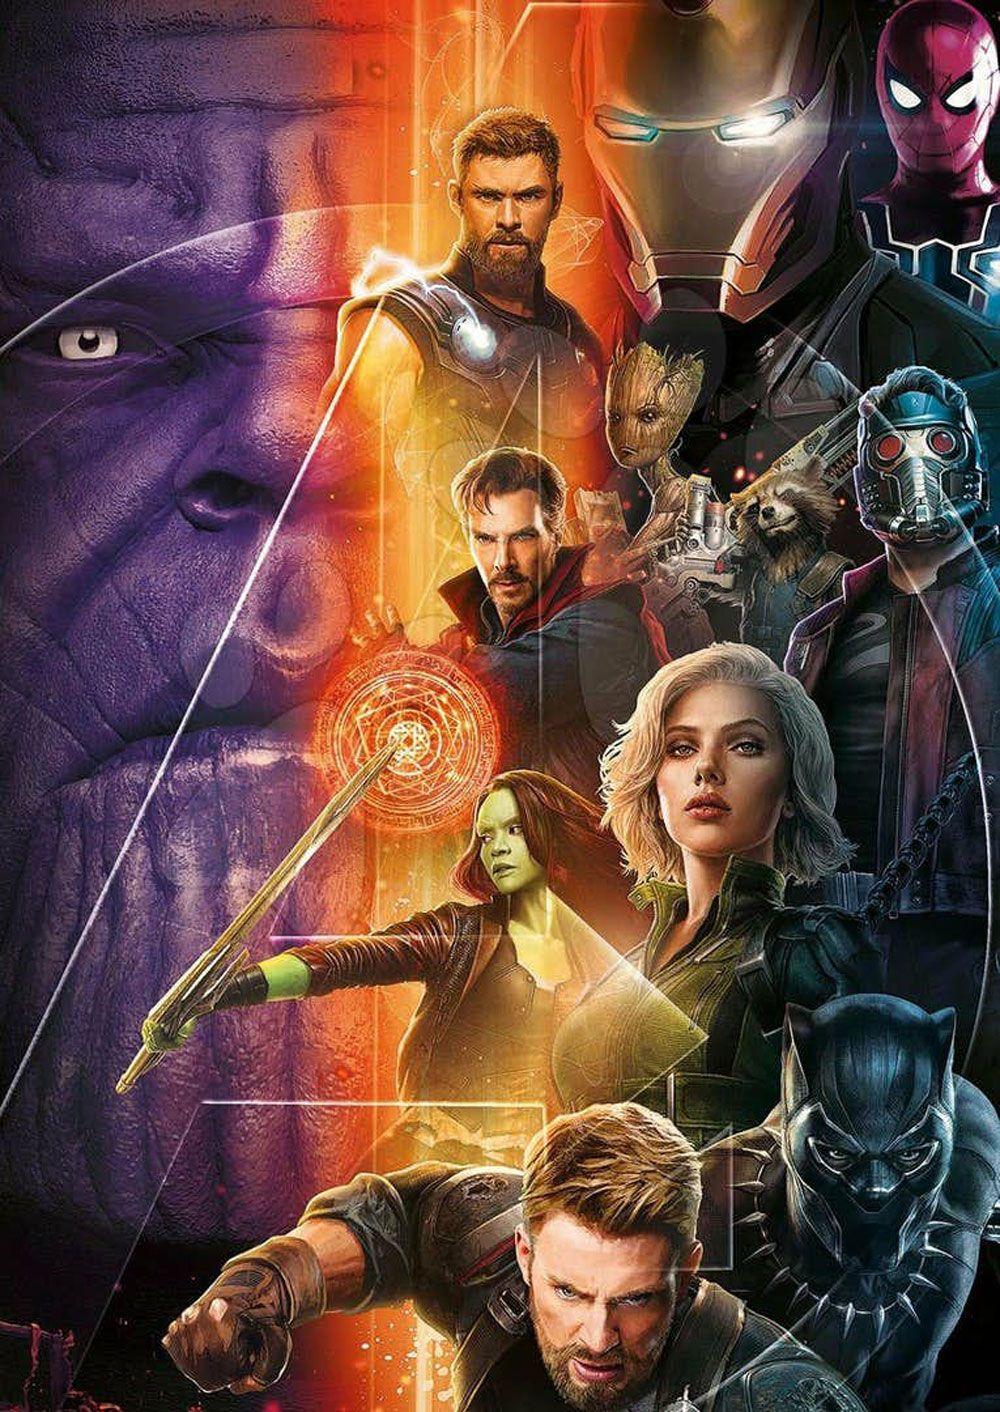 Nonton Avenger Infinity War : nonton, avenger, infinity, Avengers, Infinity, Movie, Lasoparecords